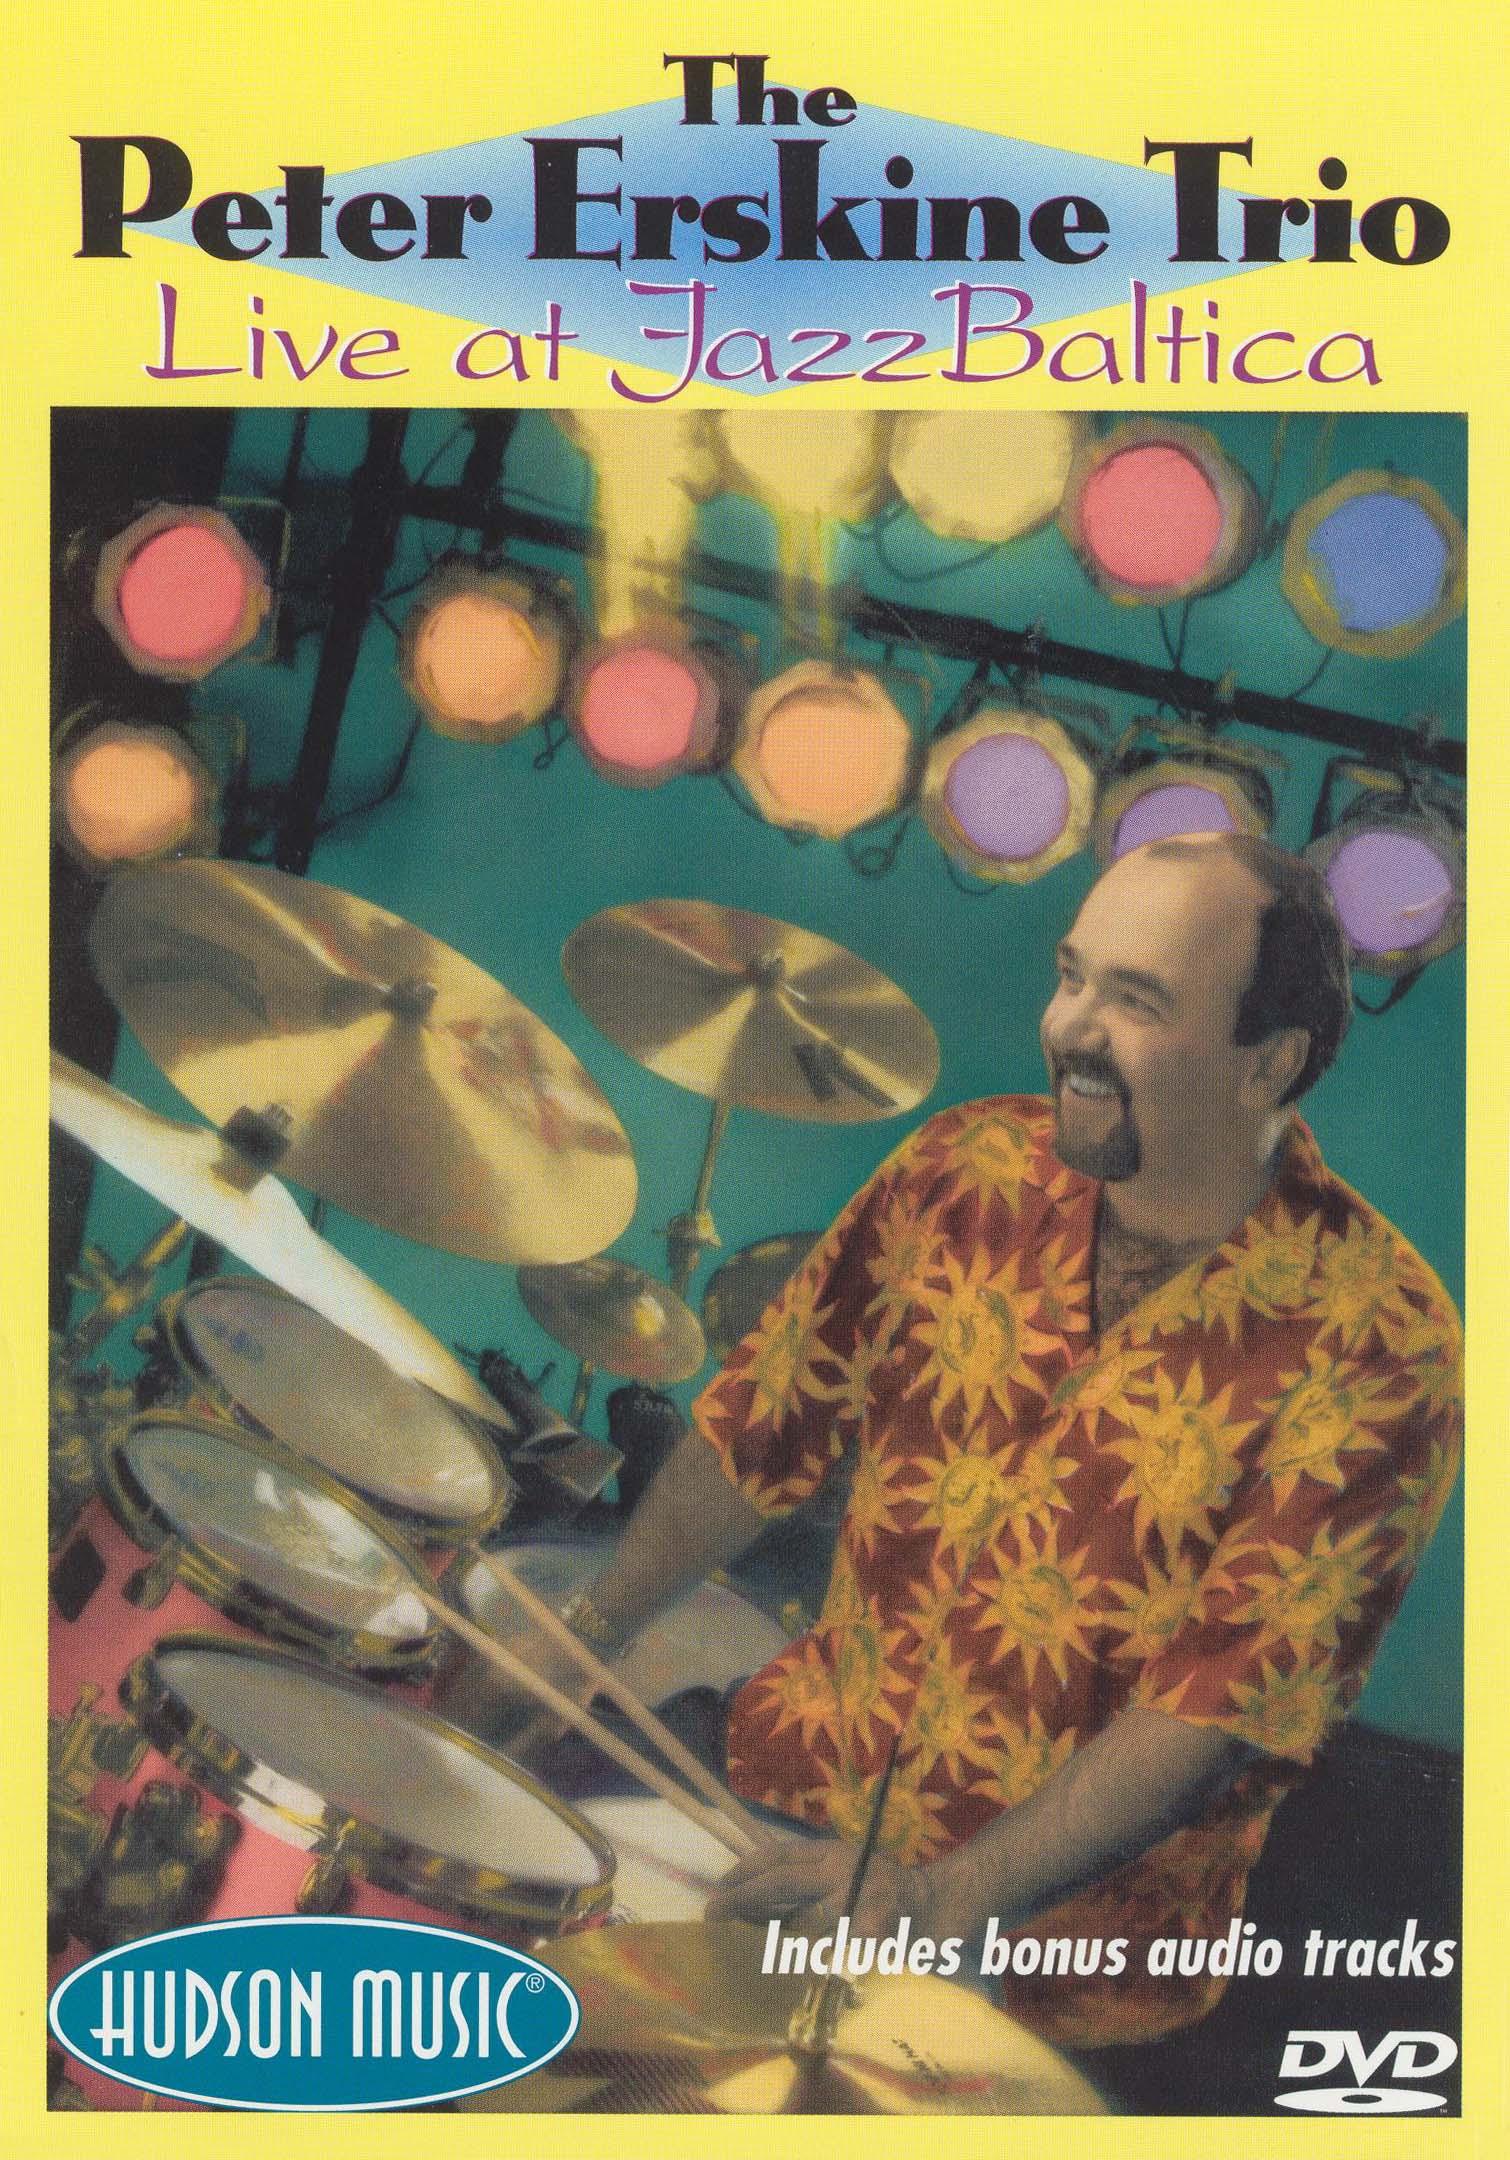 Erskine Jazz Baltica